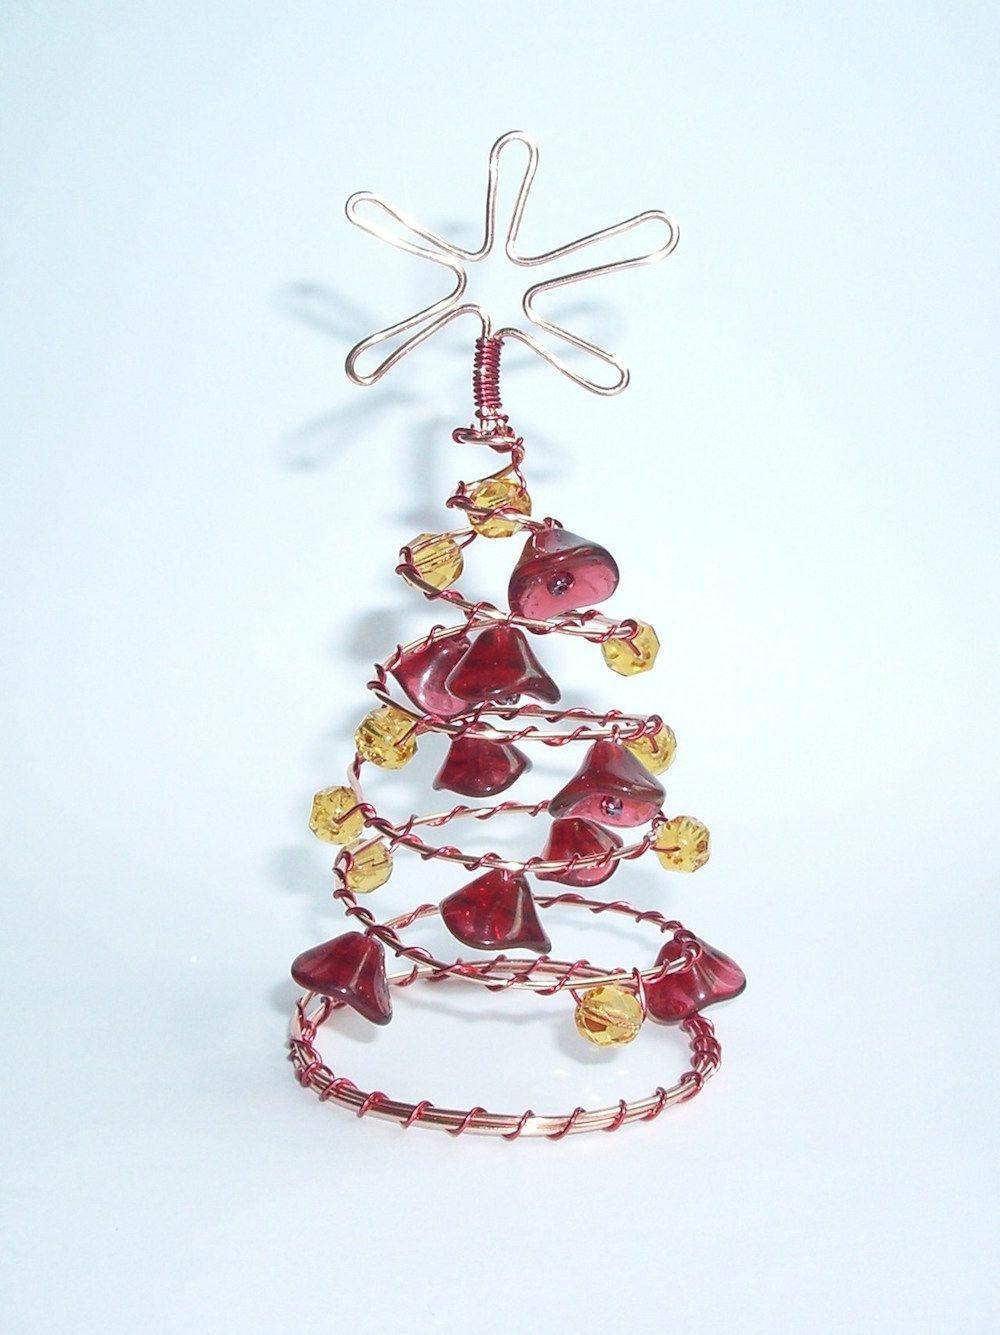 e7c5d3a72 Návod na drátované vánoční ozdoby - stromečky | Návody zdarma / Free ...